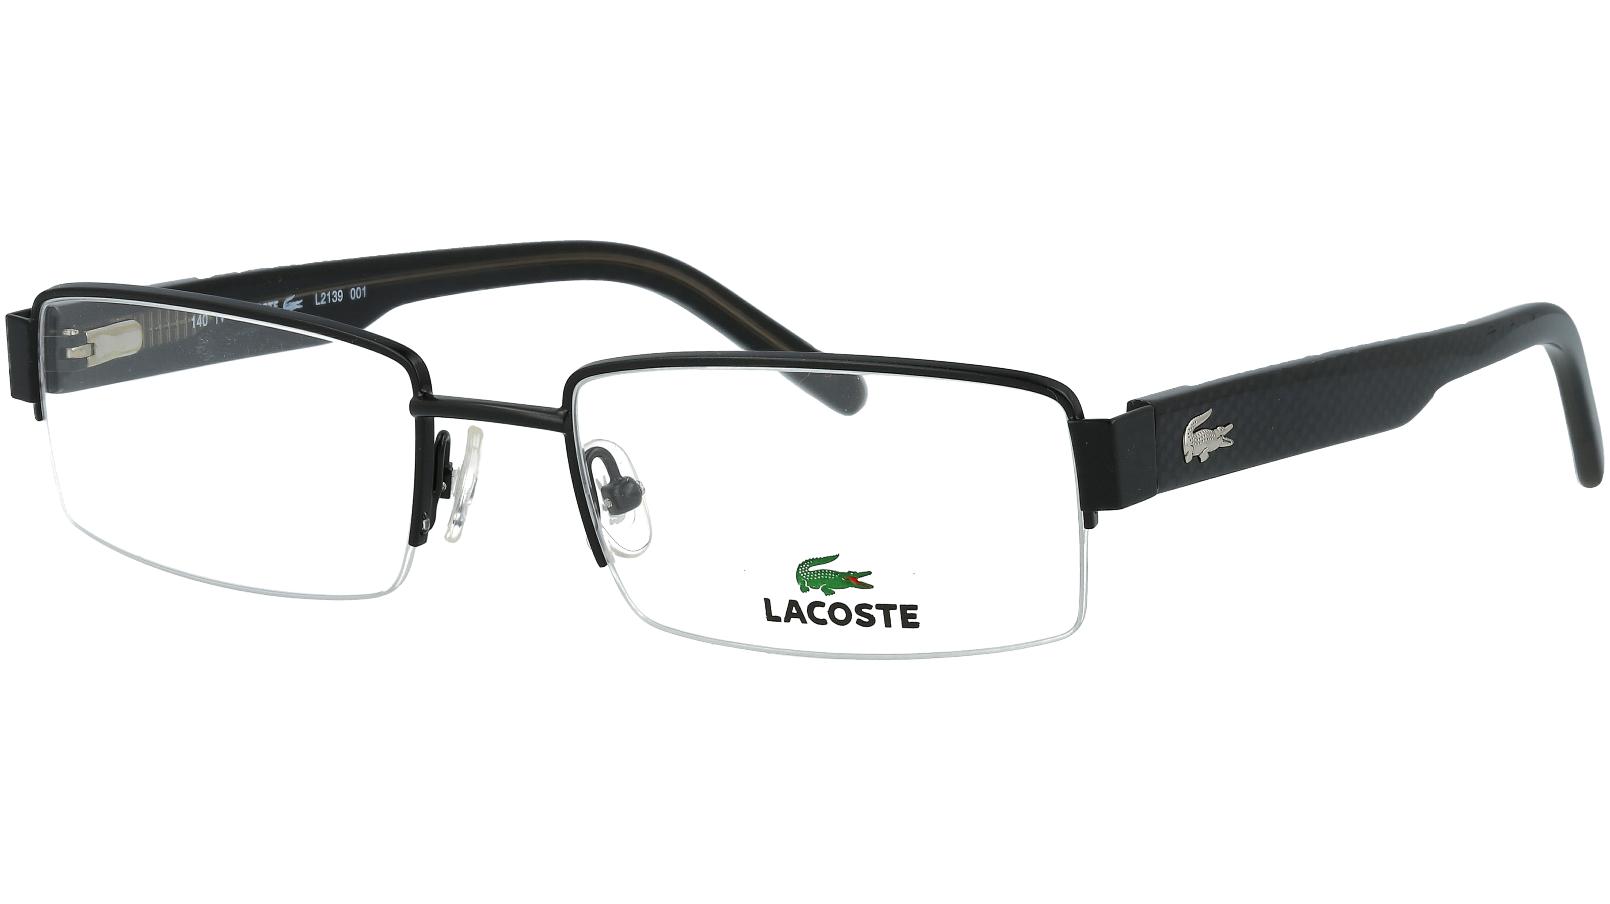 Lacoste L2139 001 53 Black Glasses